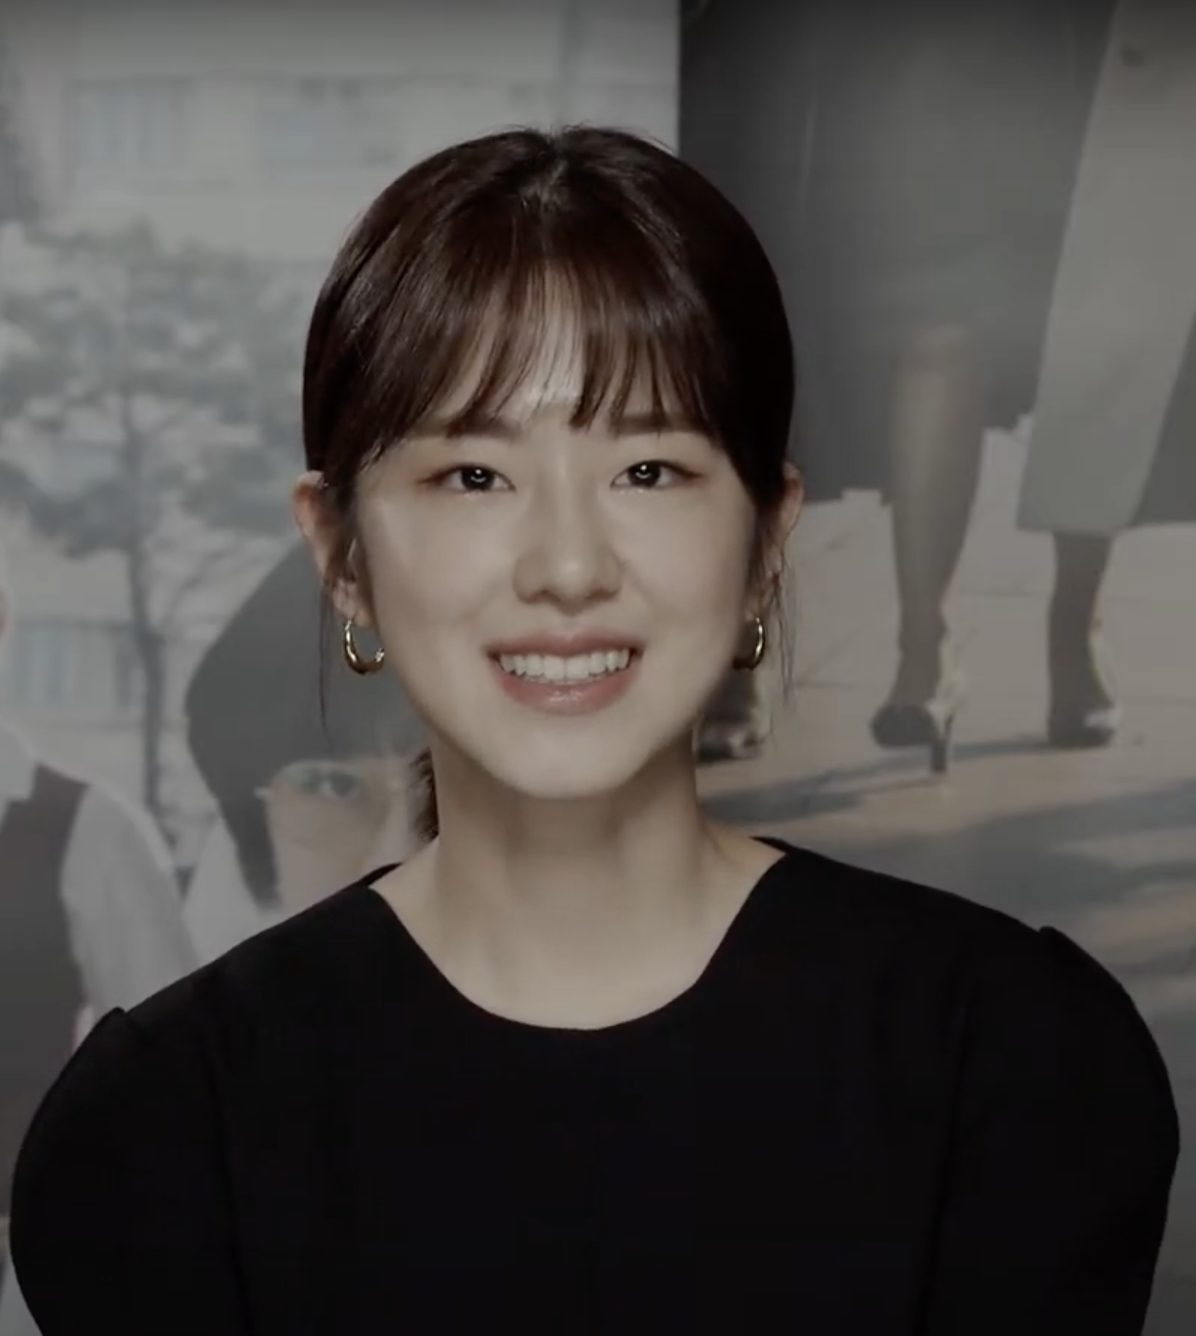 Park Hye Su Wikipedia Zodiac signs don't equal people. park hye su wikipedia